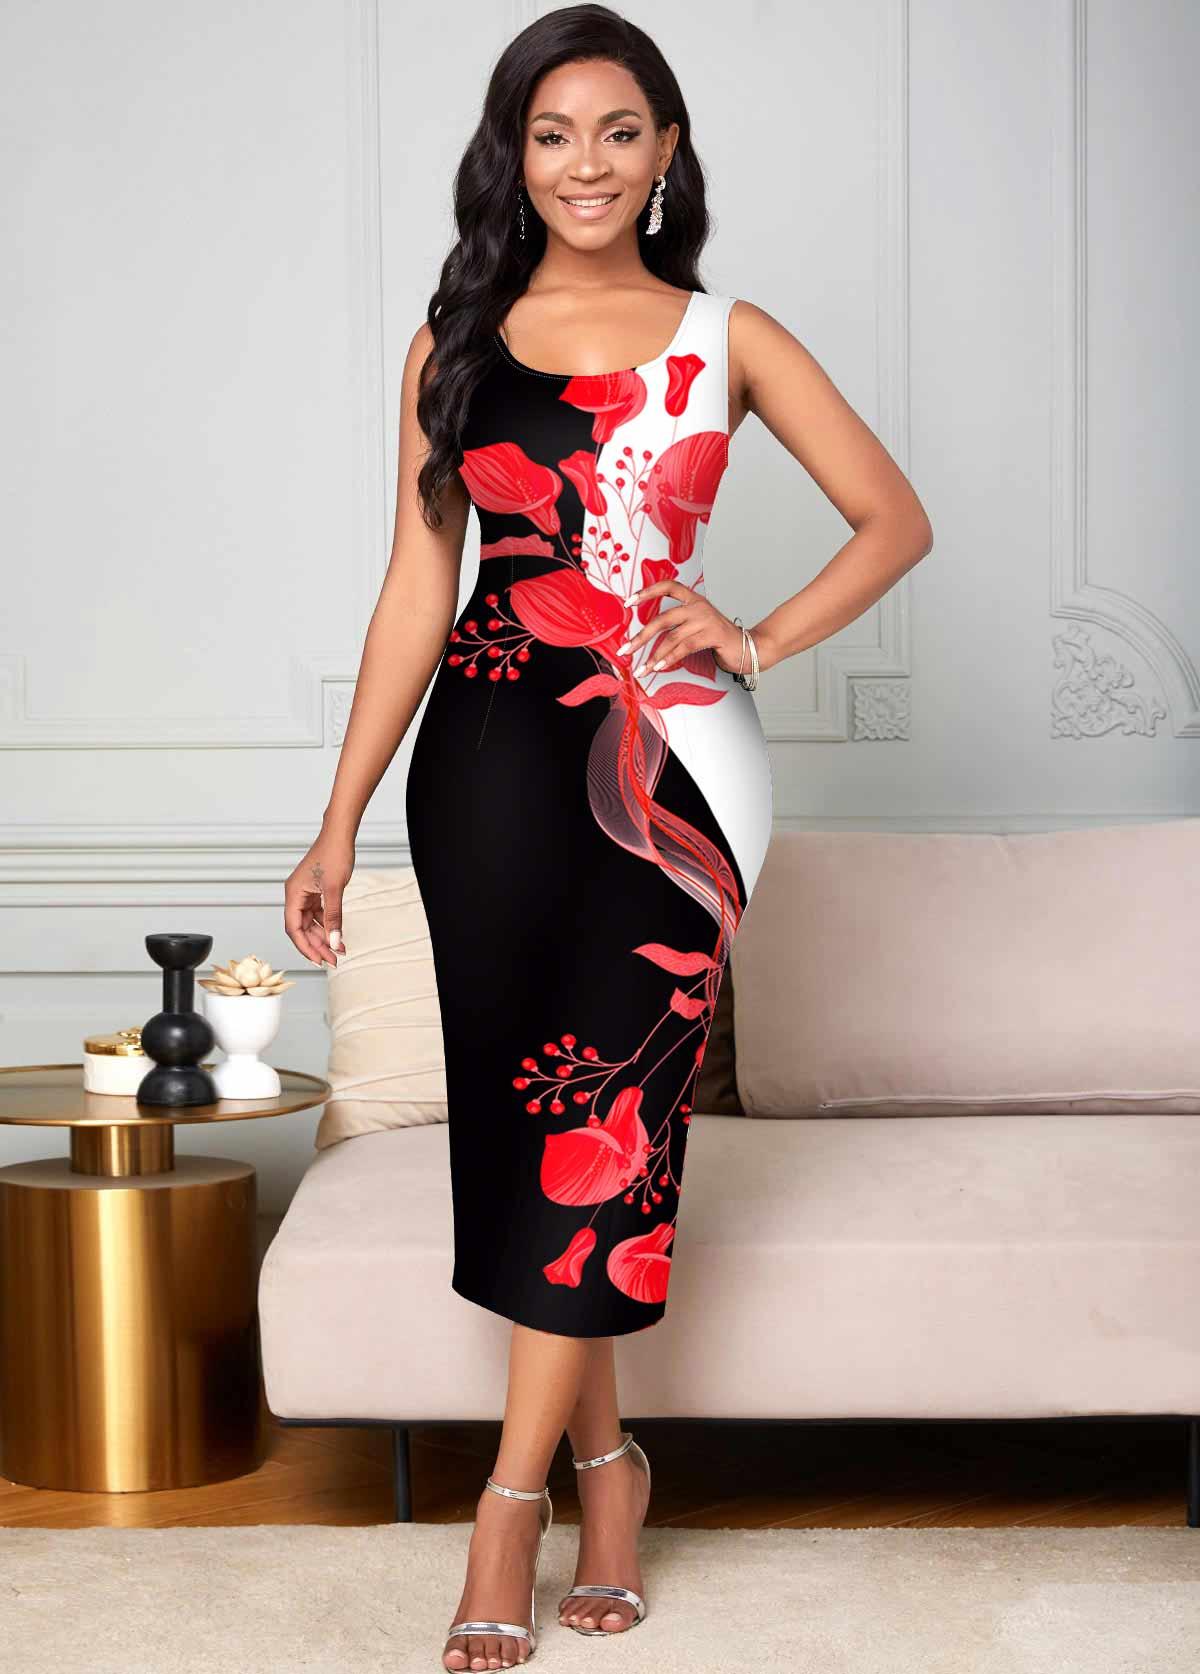 ROTITA Floral Print Sleeveless Contrast Bodycon Dress